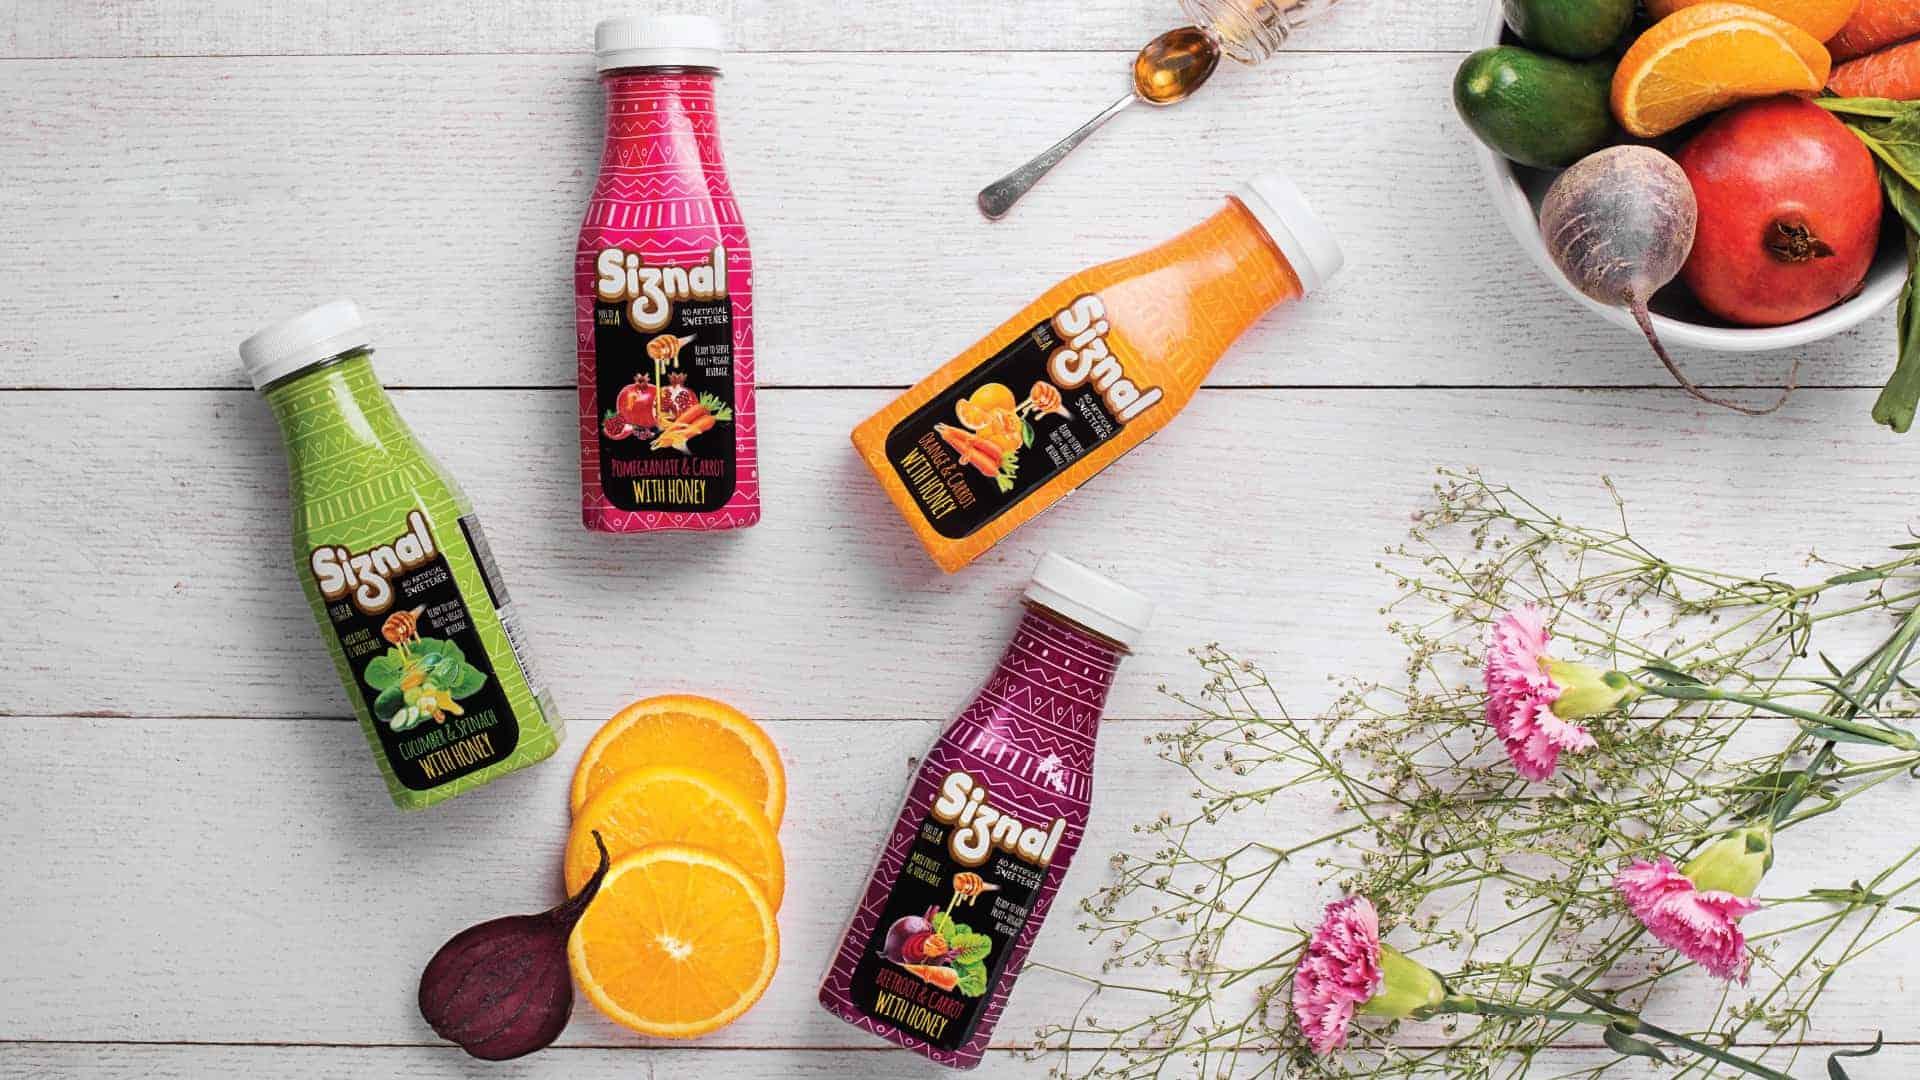 Siznal Juice Packaging